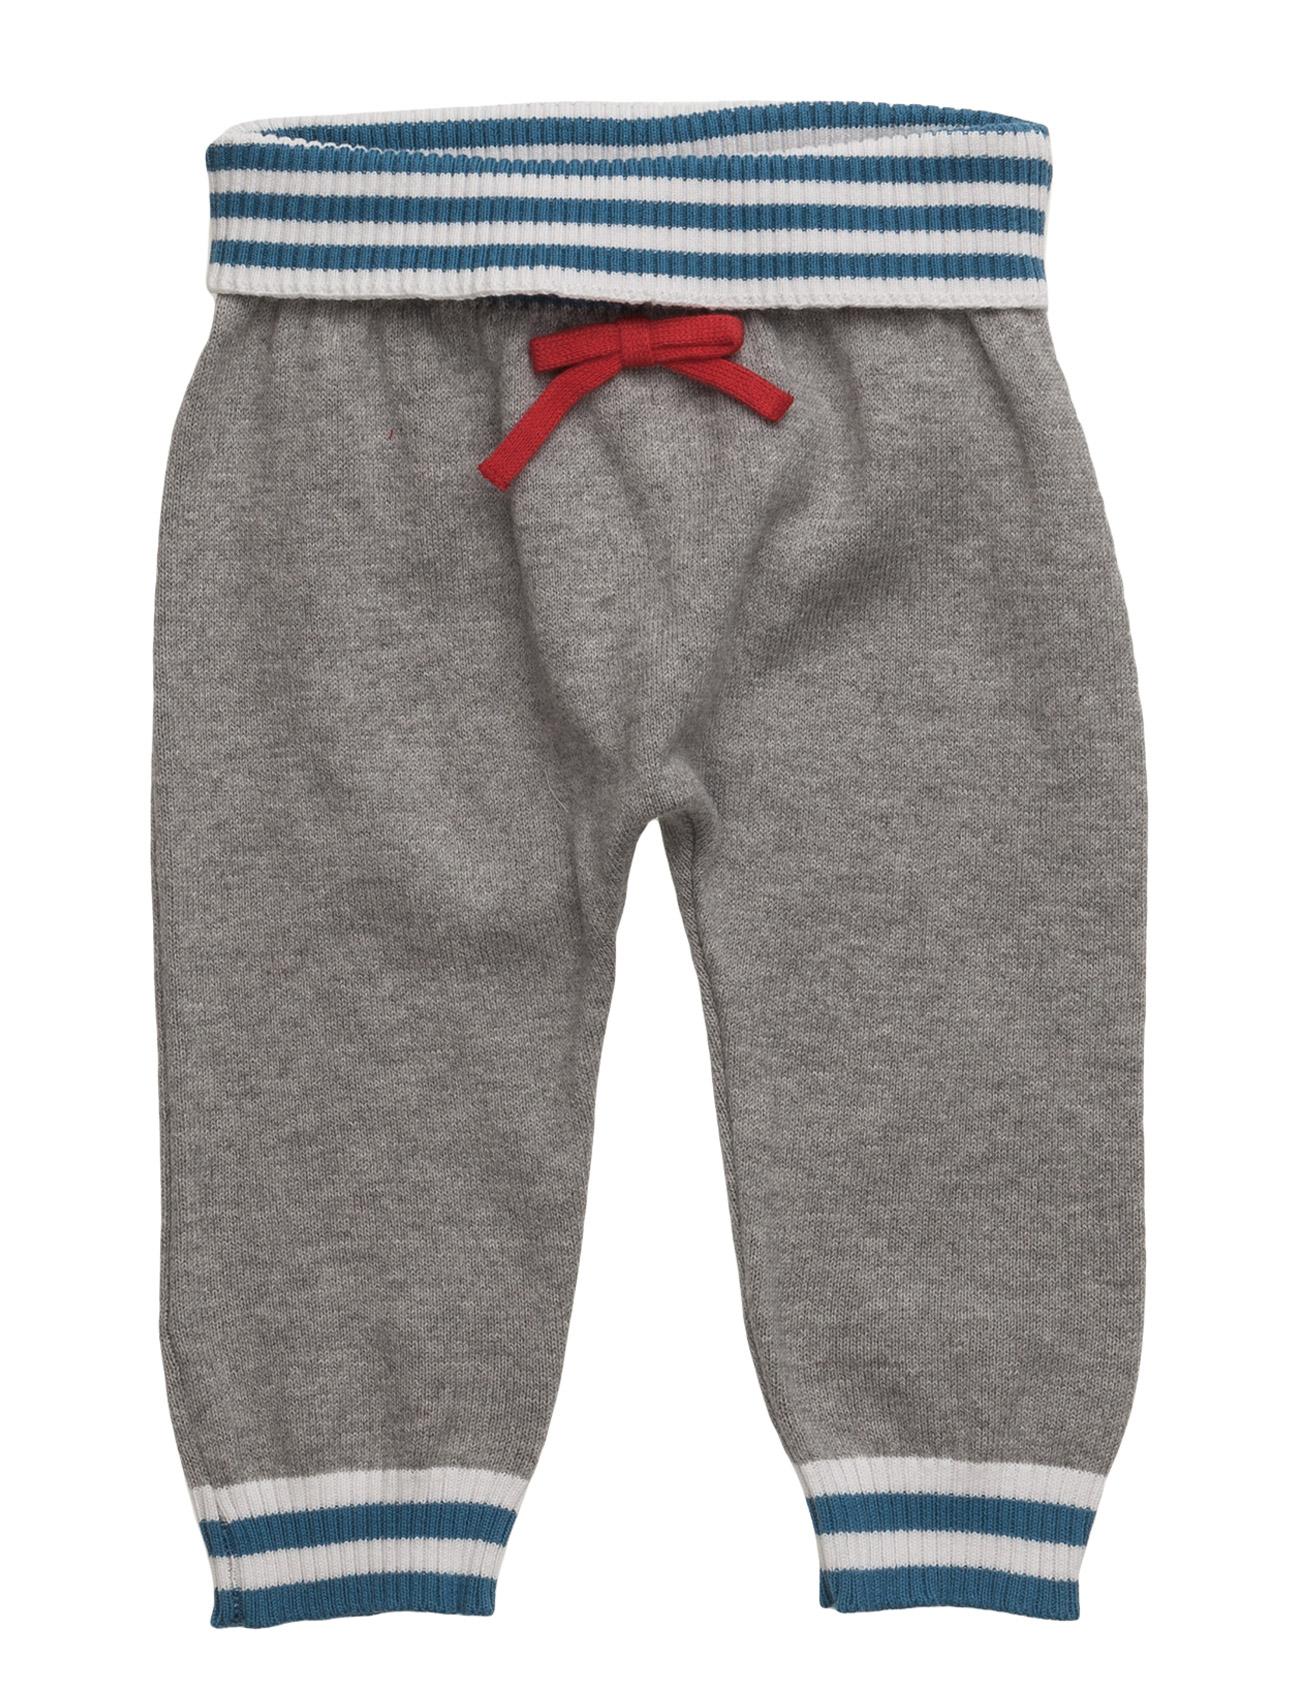 Trousers United Colors of Benetton  til Børn i Blå